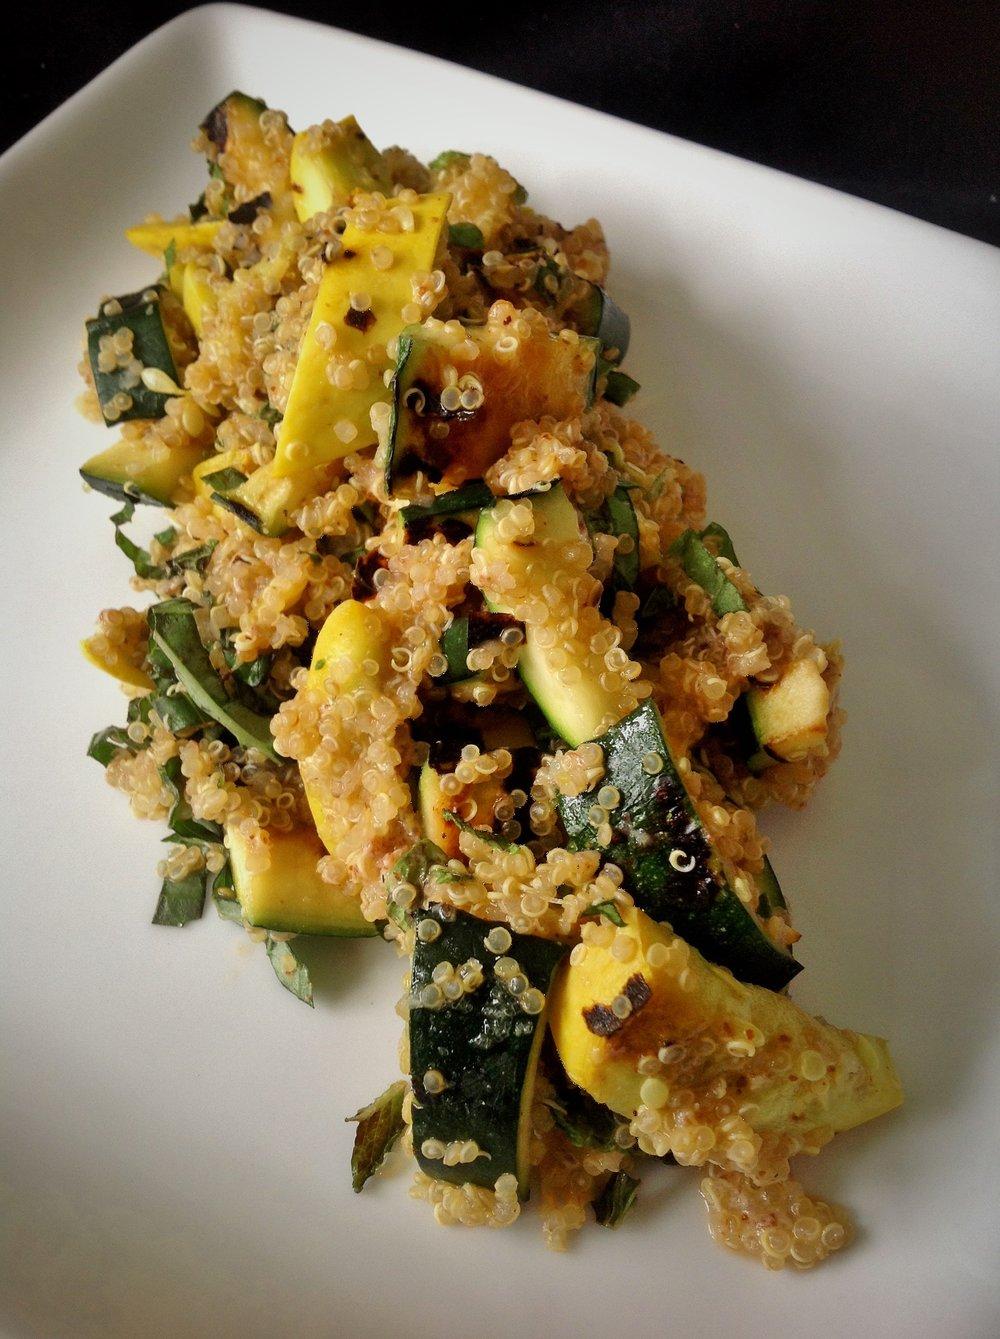 Charred Zucchini and Summer Squash Quinoa - Healthy, Gluten-Free, Oil-Free, Plant-Based, Vegan Grill Salad Recipe